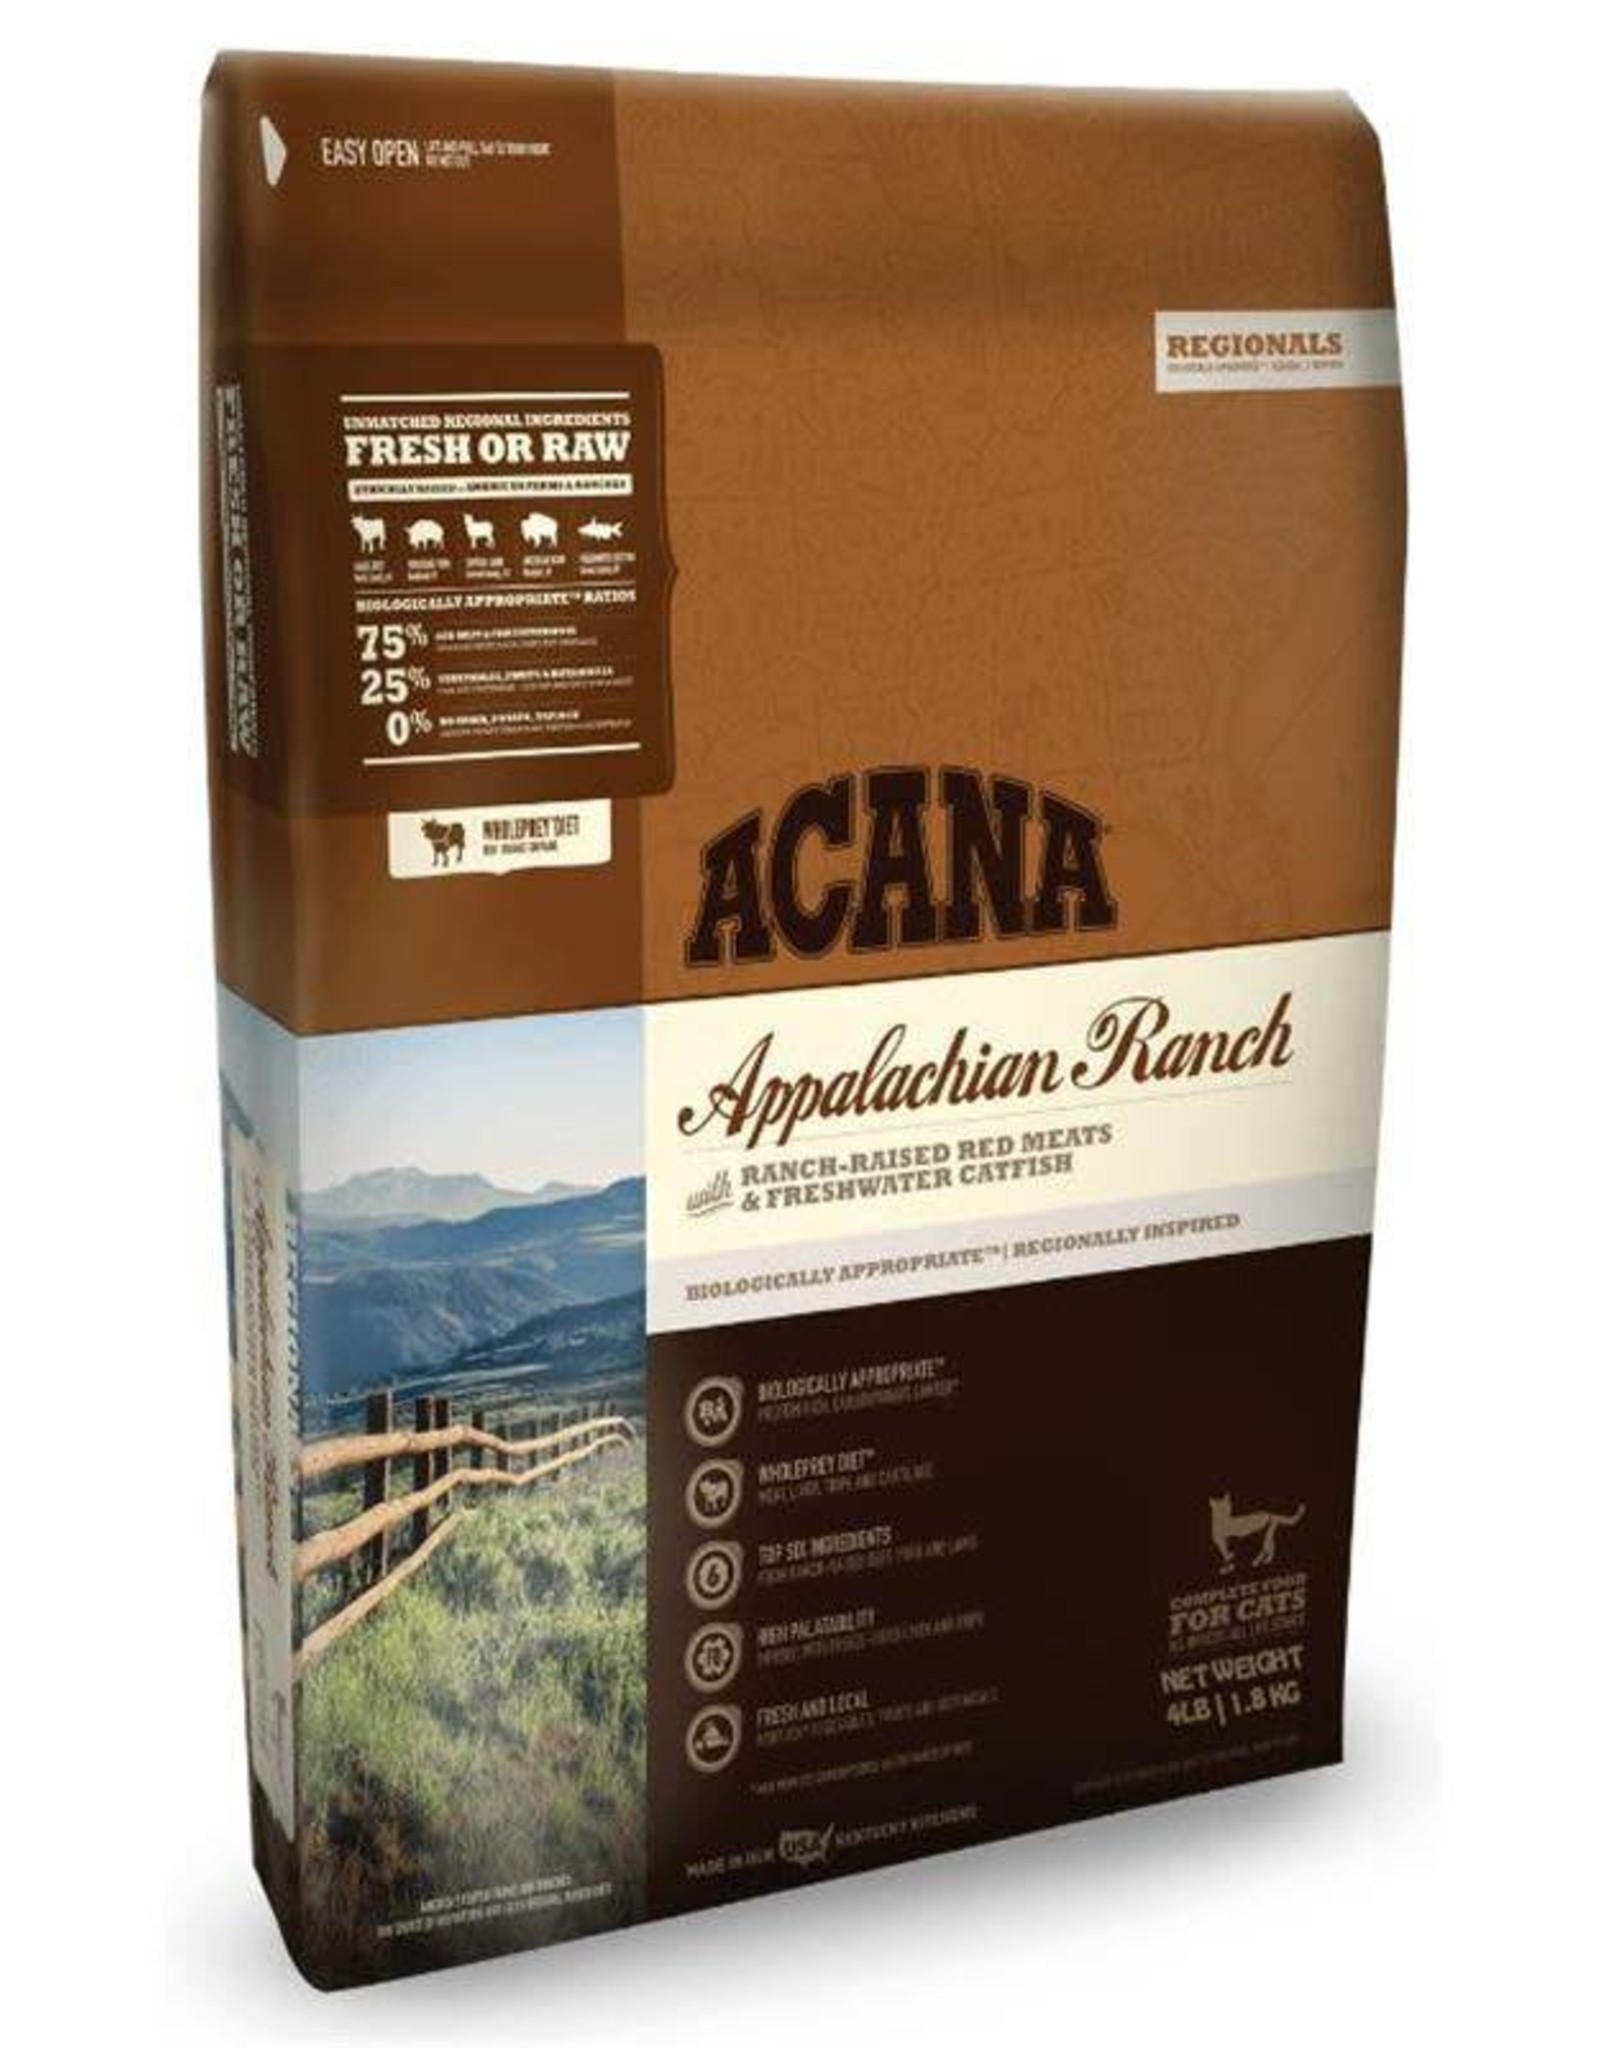 Acana ACANA APPALACHIAN RANCH-RAISED RED MEAT& FRESH WATER CATFISH- CAT FOOD- 4 LB.